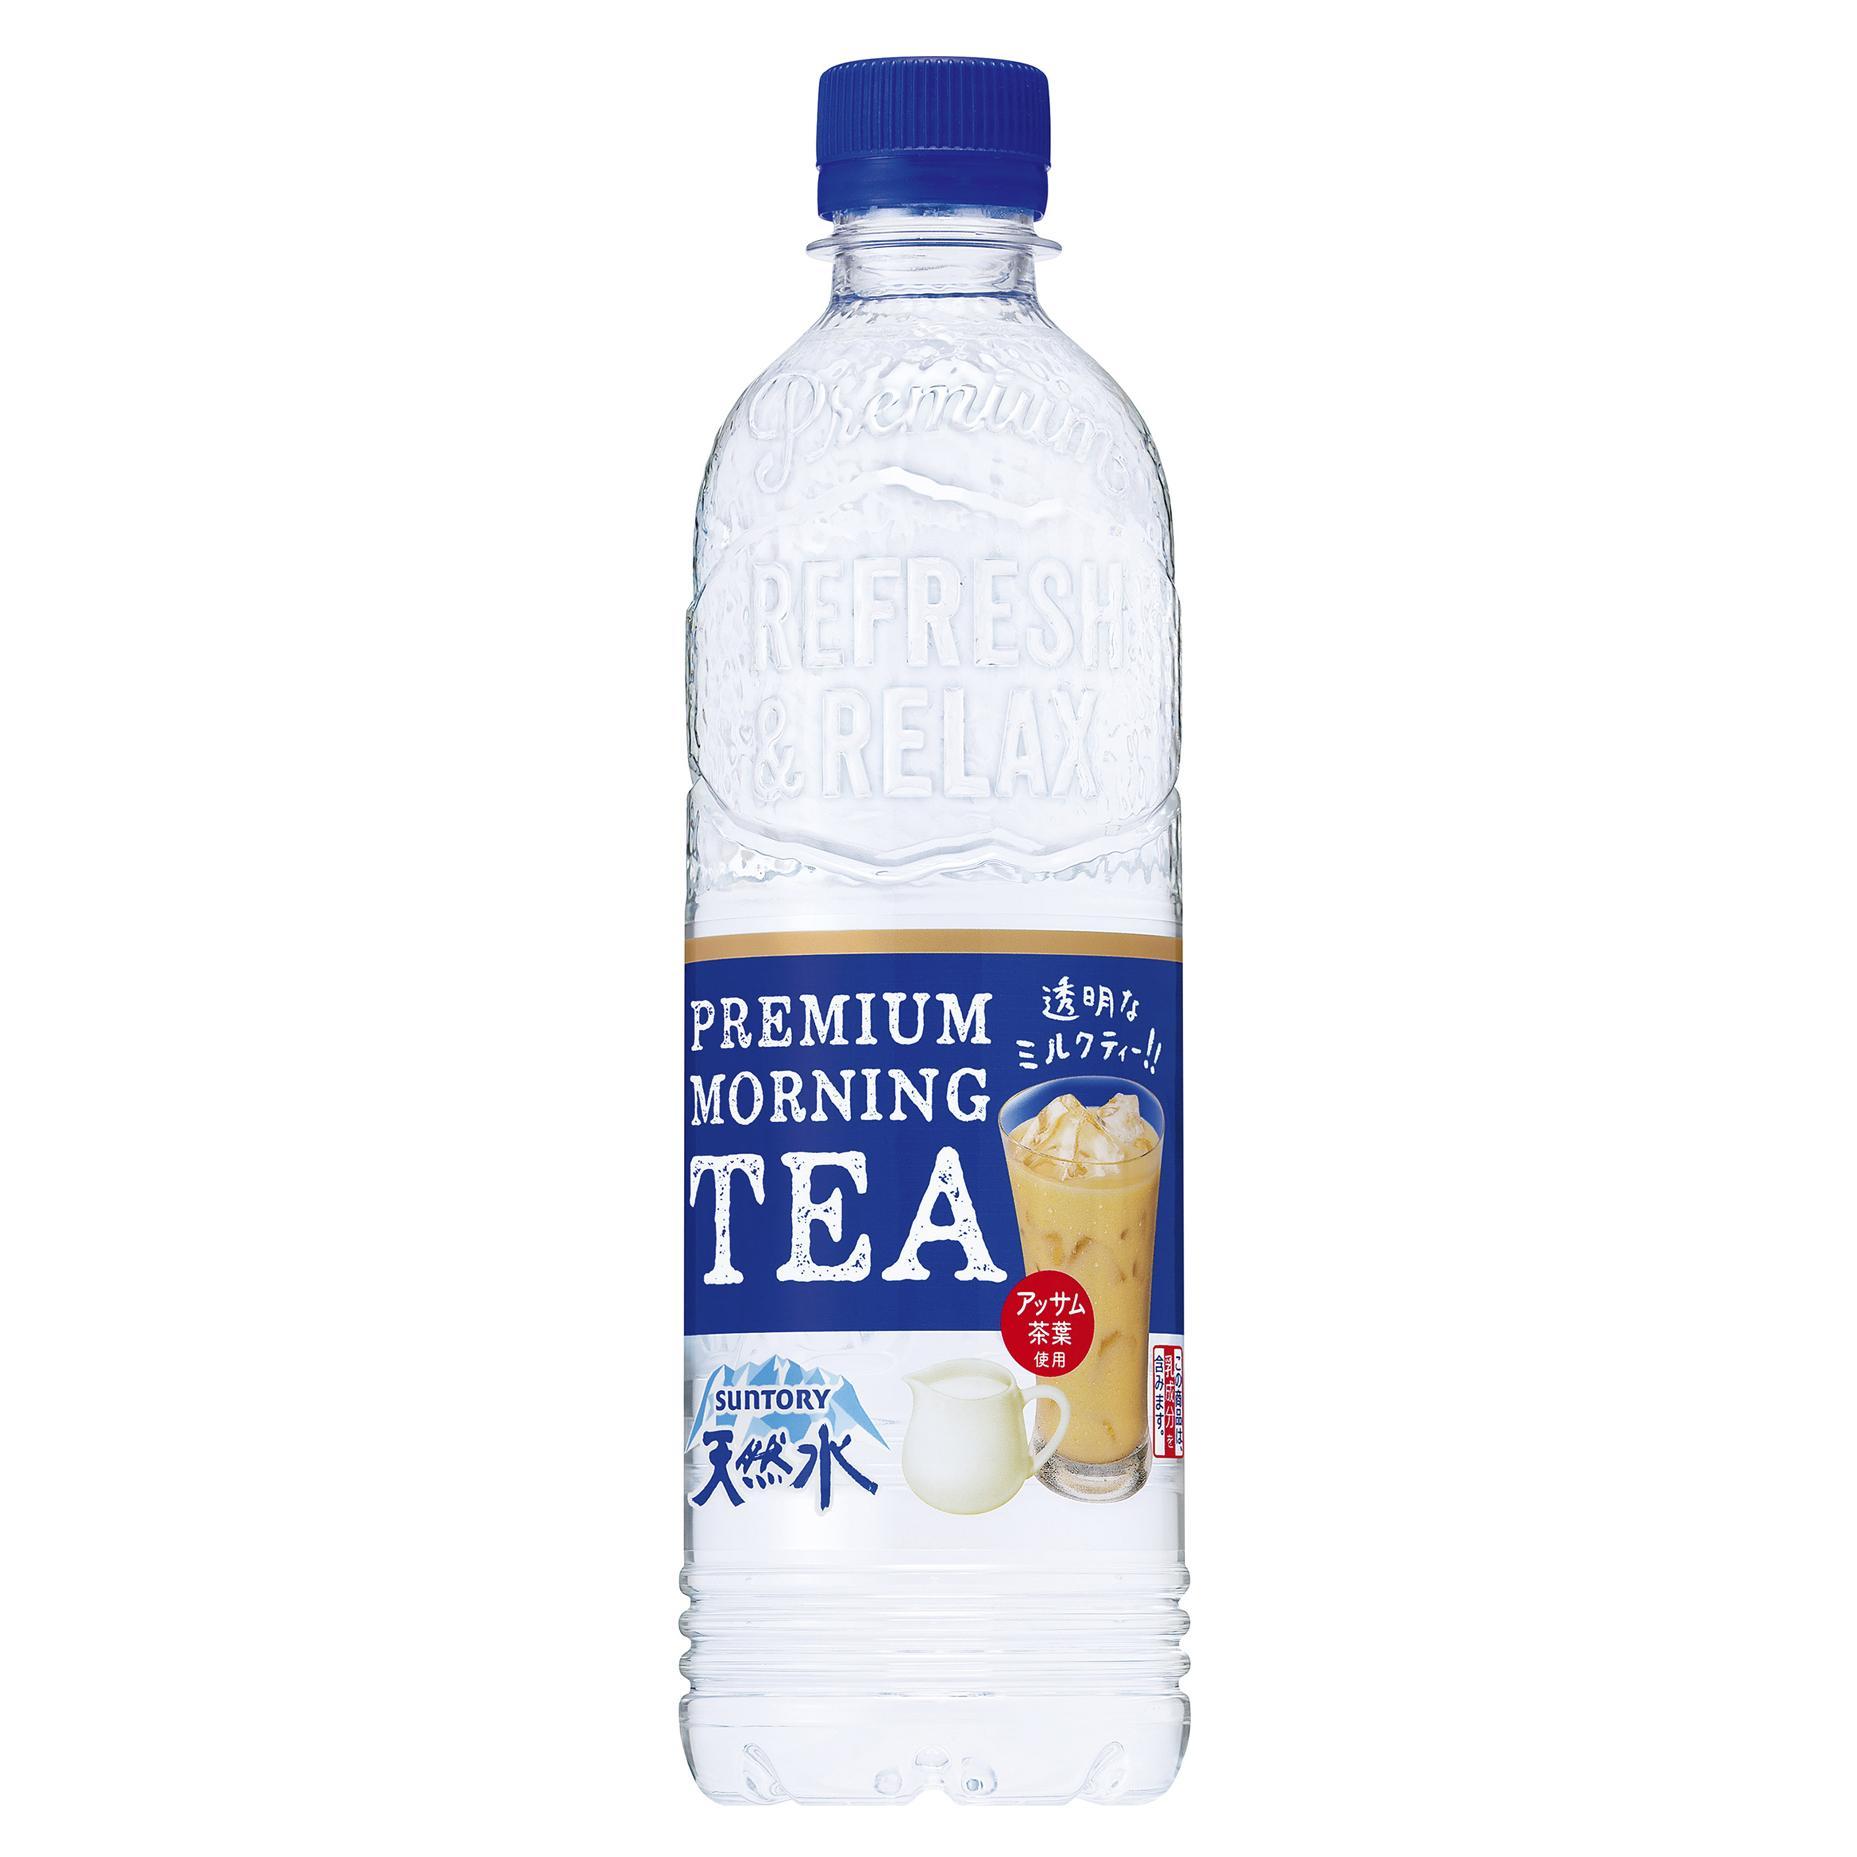 Nước suối vị trà sữa PREMIUM MORNIG TEA Suntory Nhật Bản 550ml